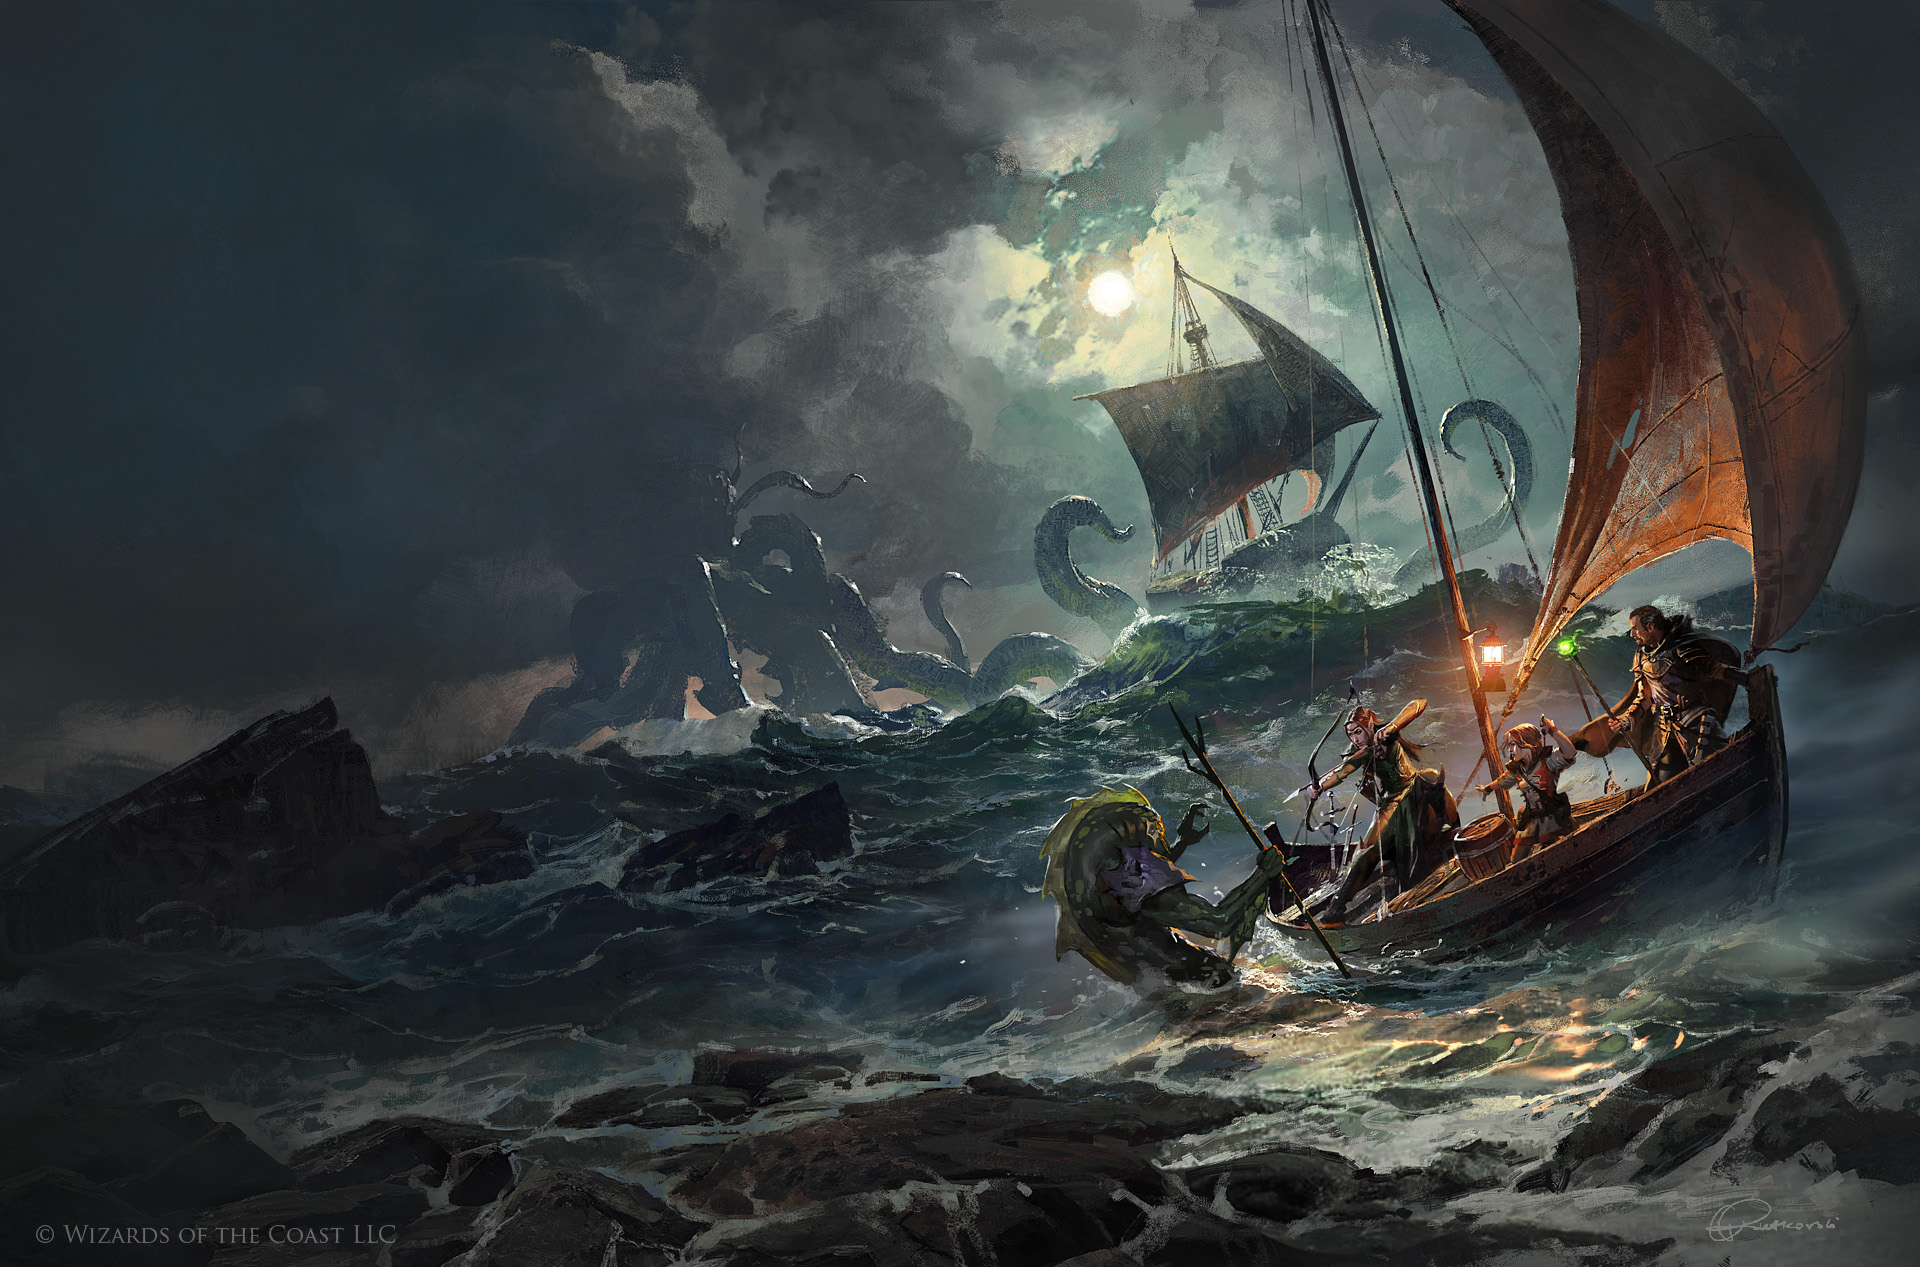 General 1920x1267 fantasy art sea monsters boat sea waves ship Cthulhu